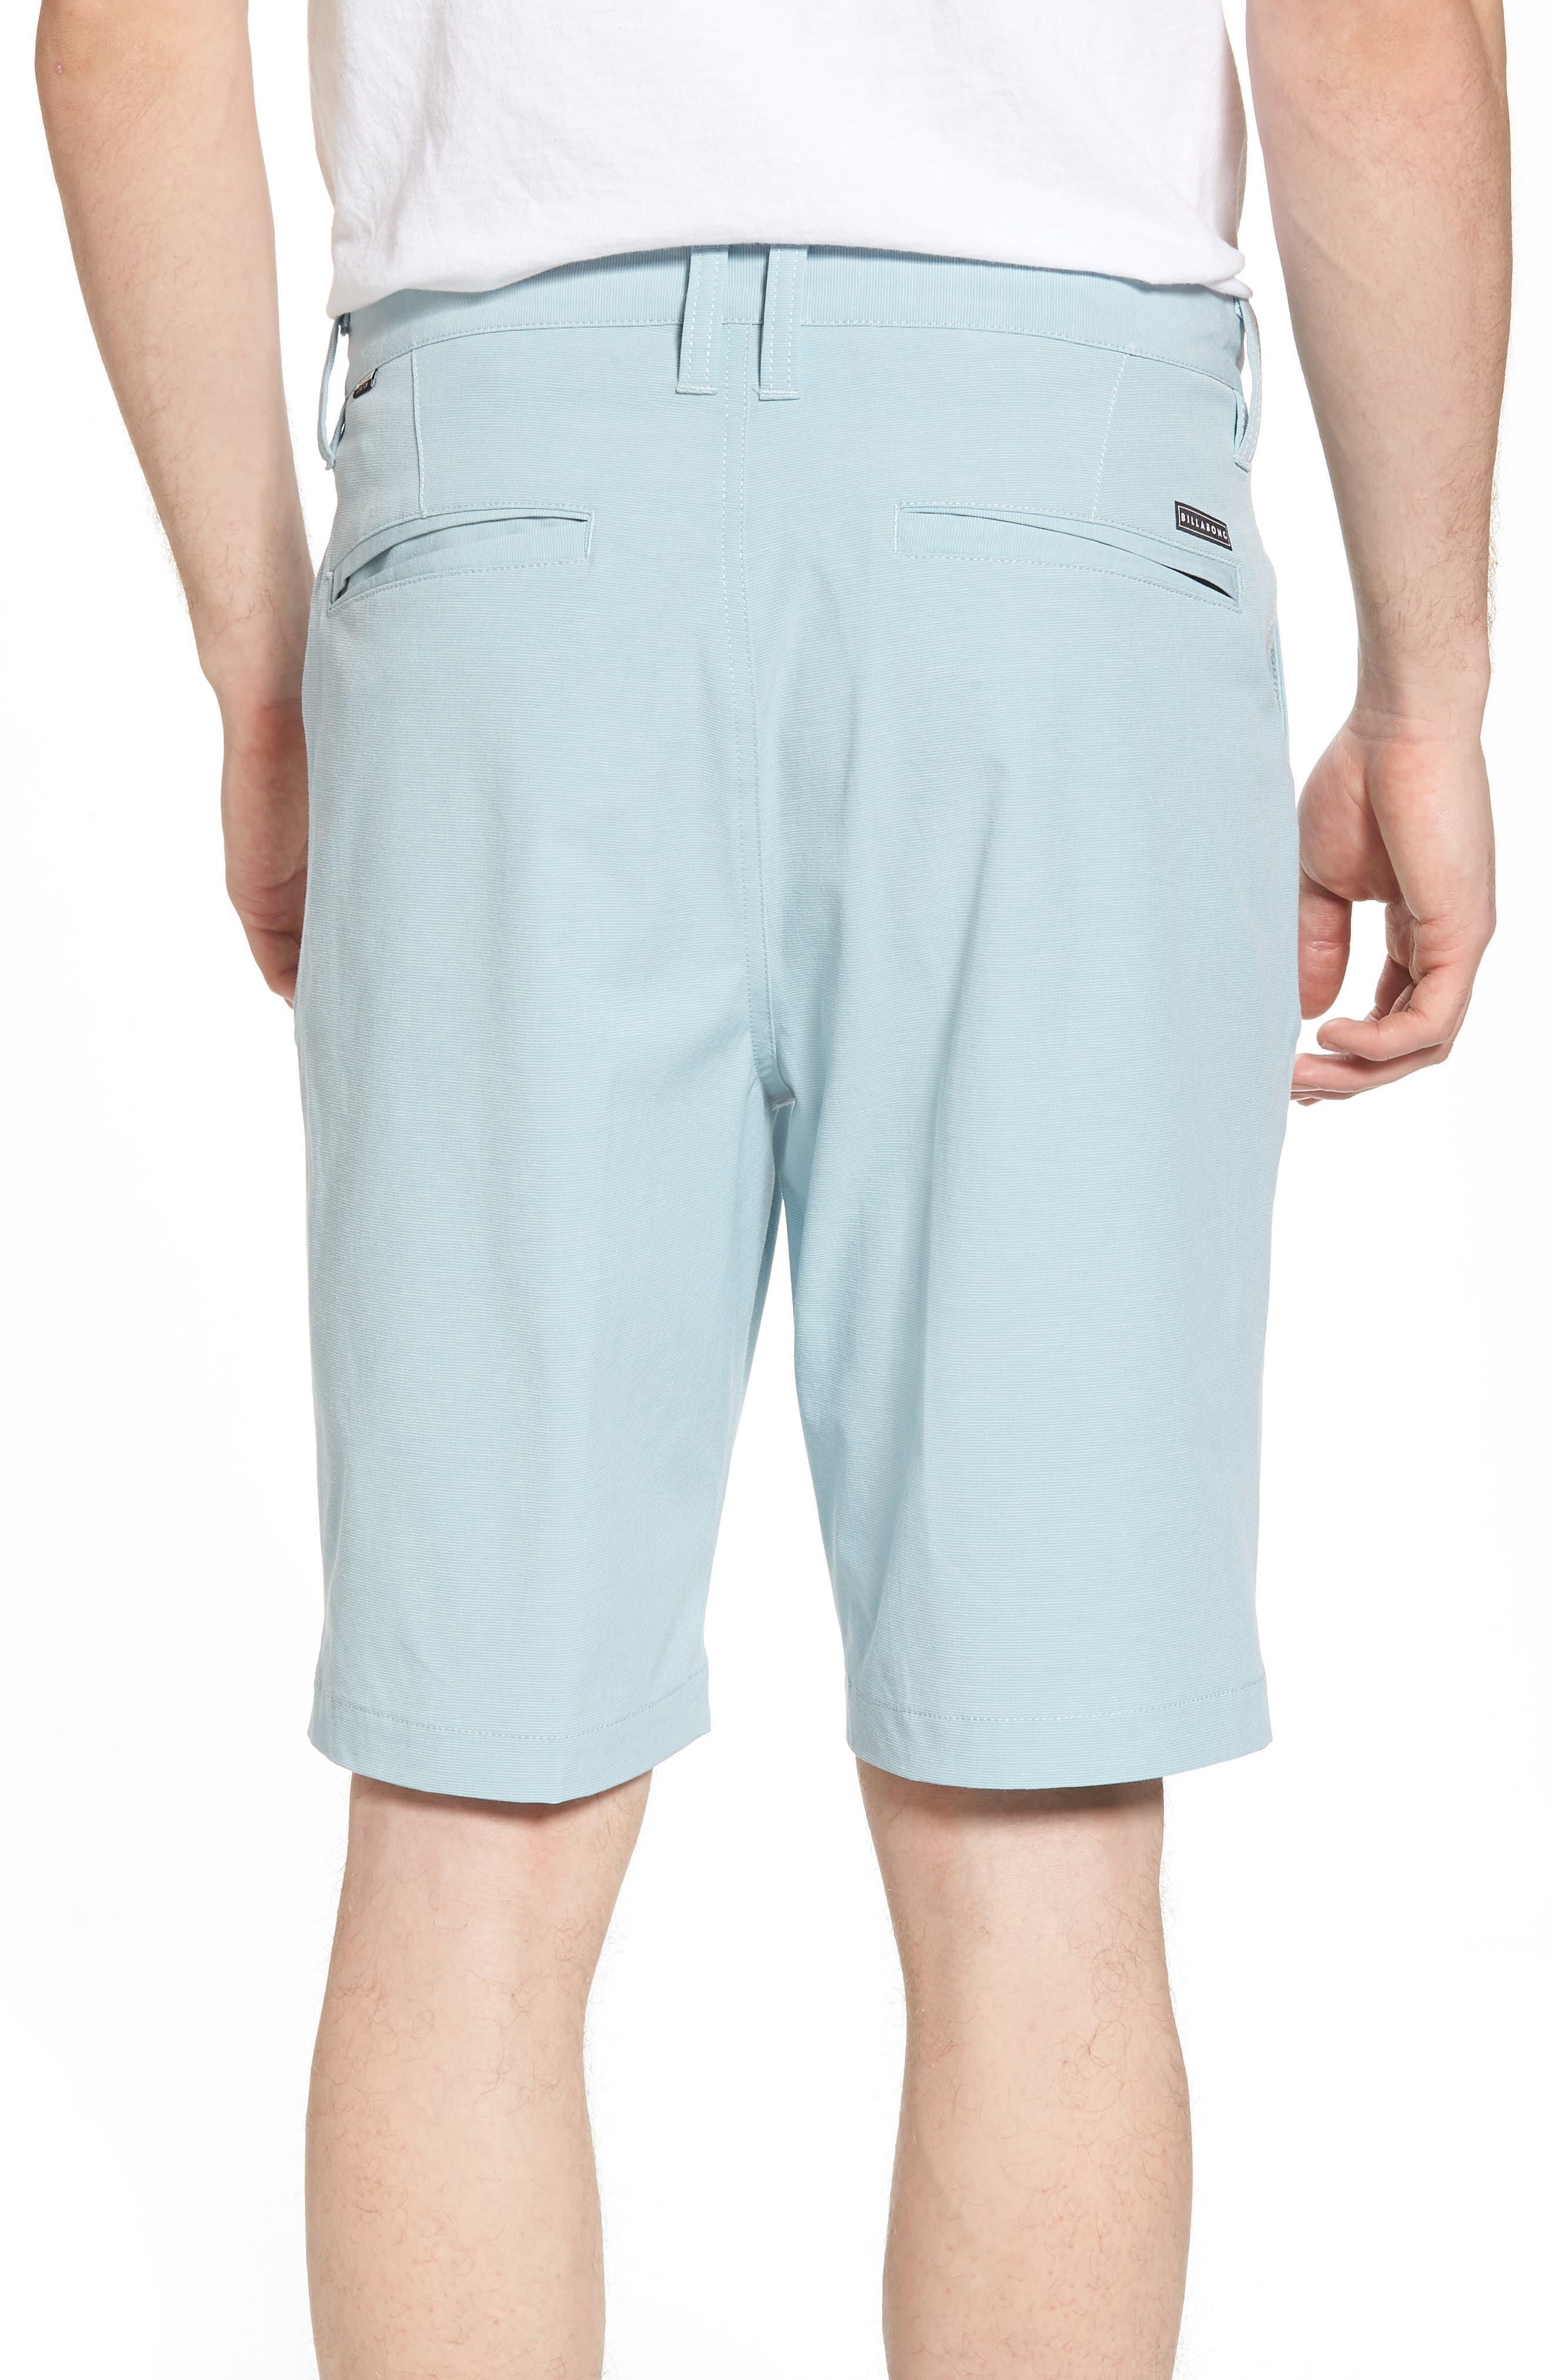 Crossfire X Hybrid Shorts,                             Alternate thumbnail 2, color,                             Dusty Blue